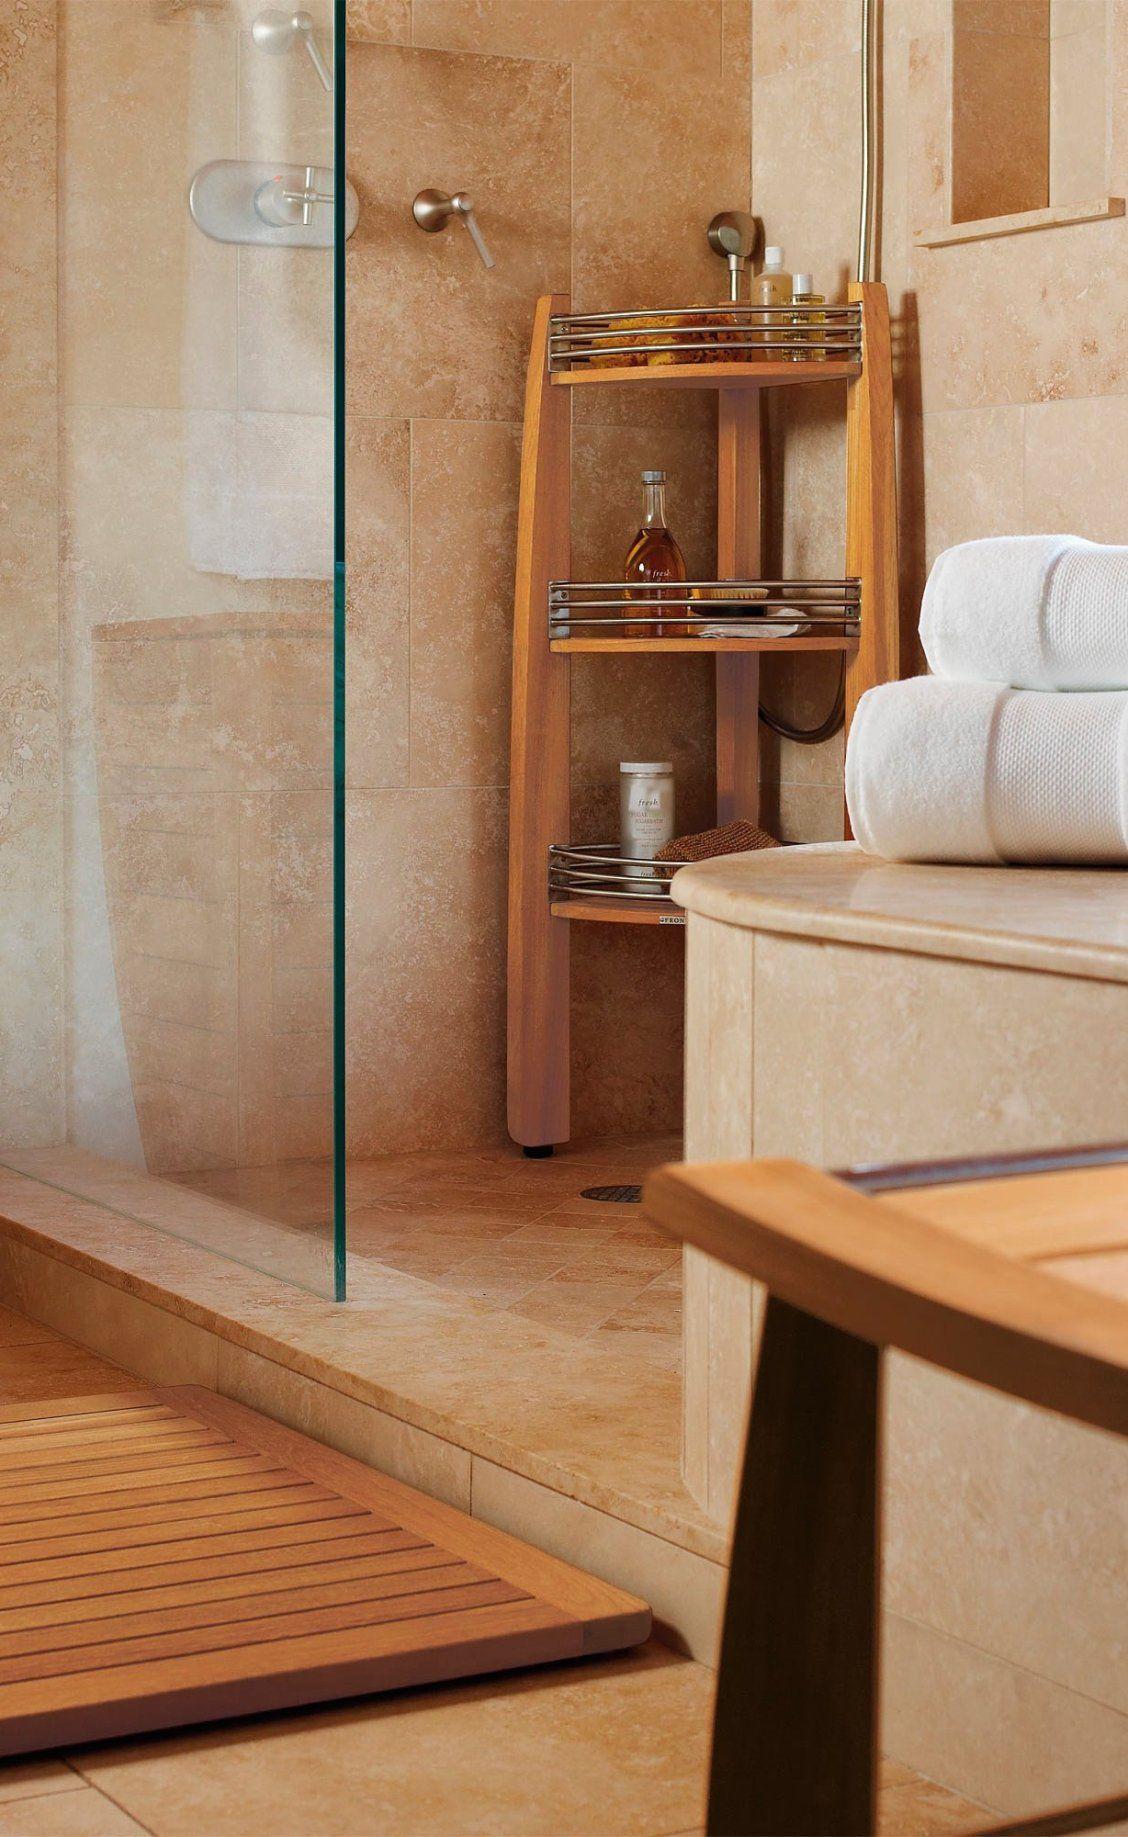 Resort Teak Corner Shelf Caddy Teak Bathroom Teak Bathroom